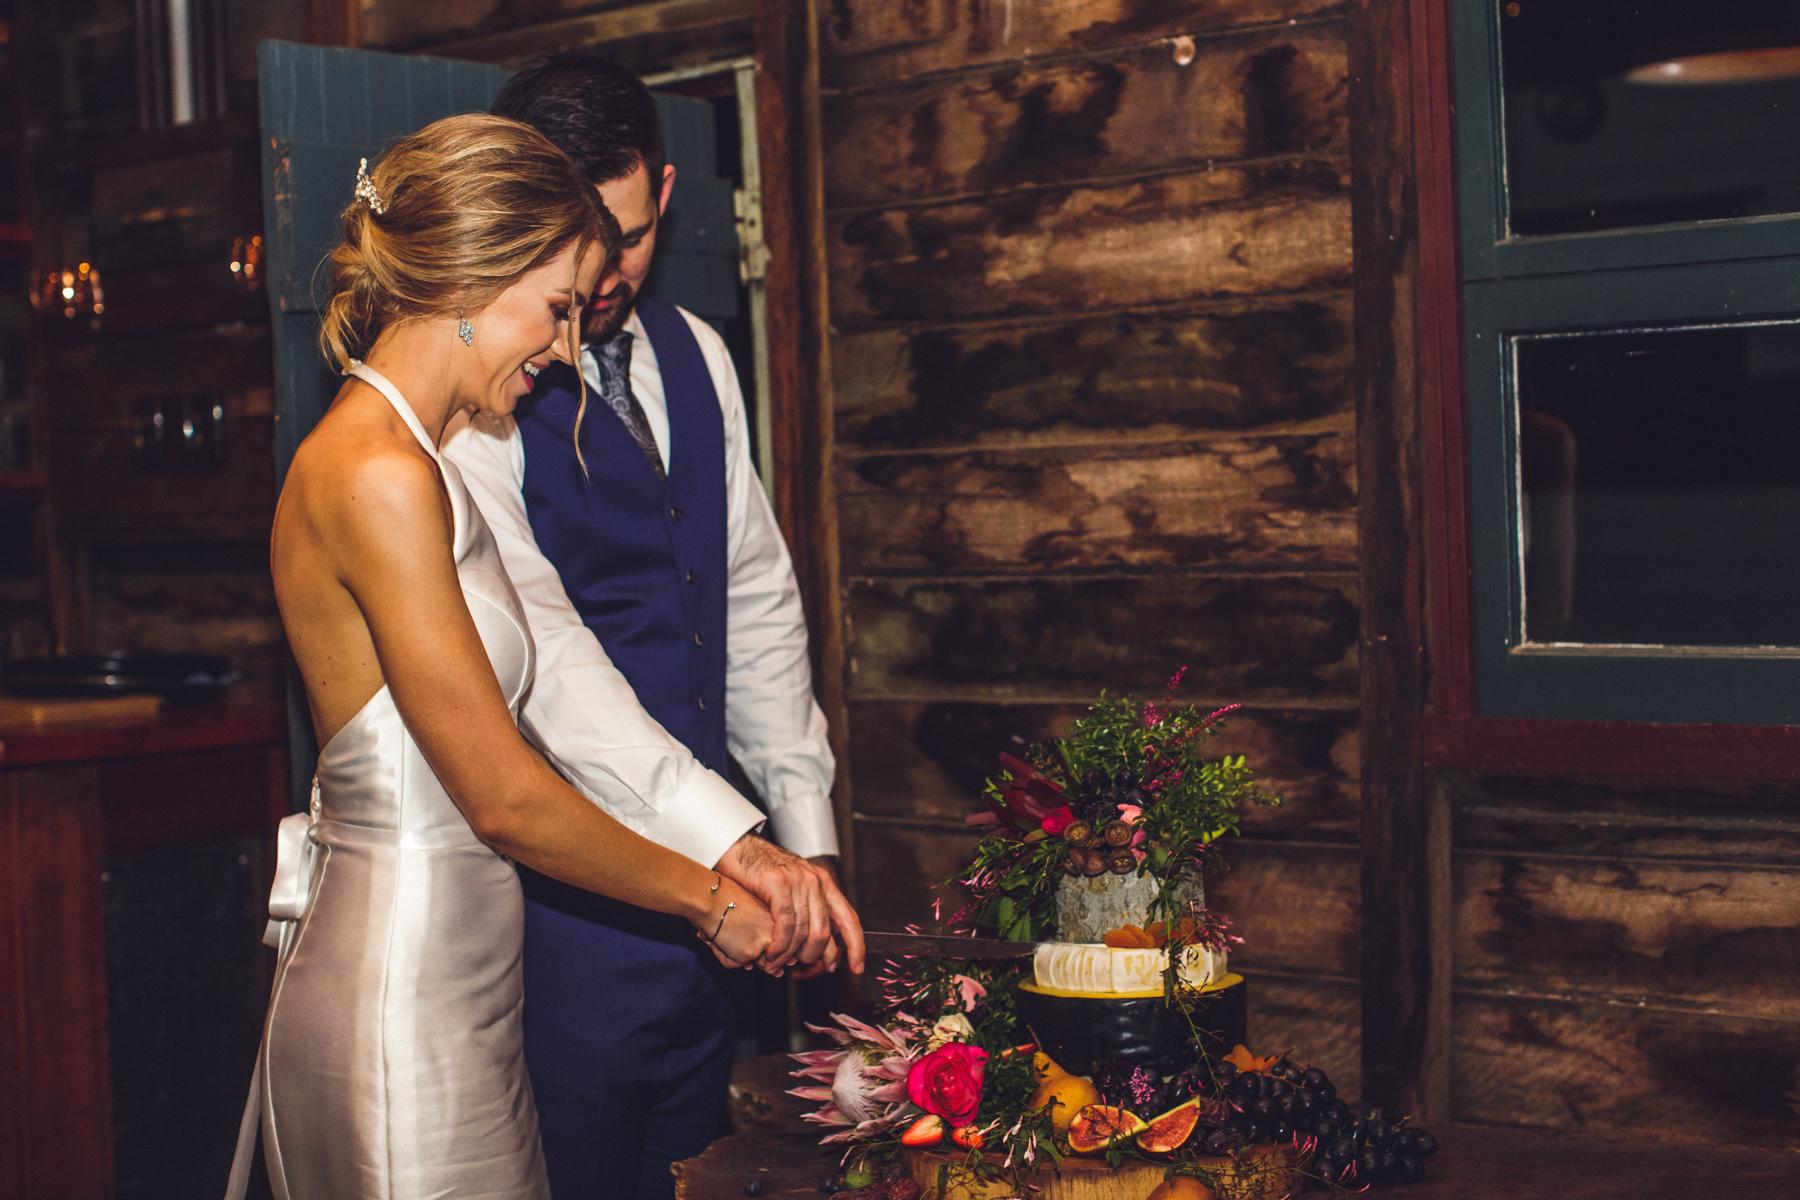 spicers-hiddenvale-wedding-118A.JPG